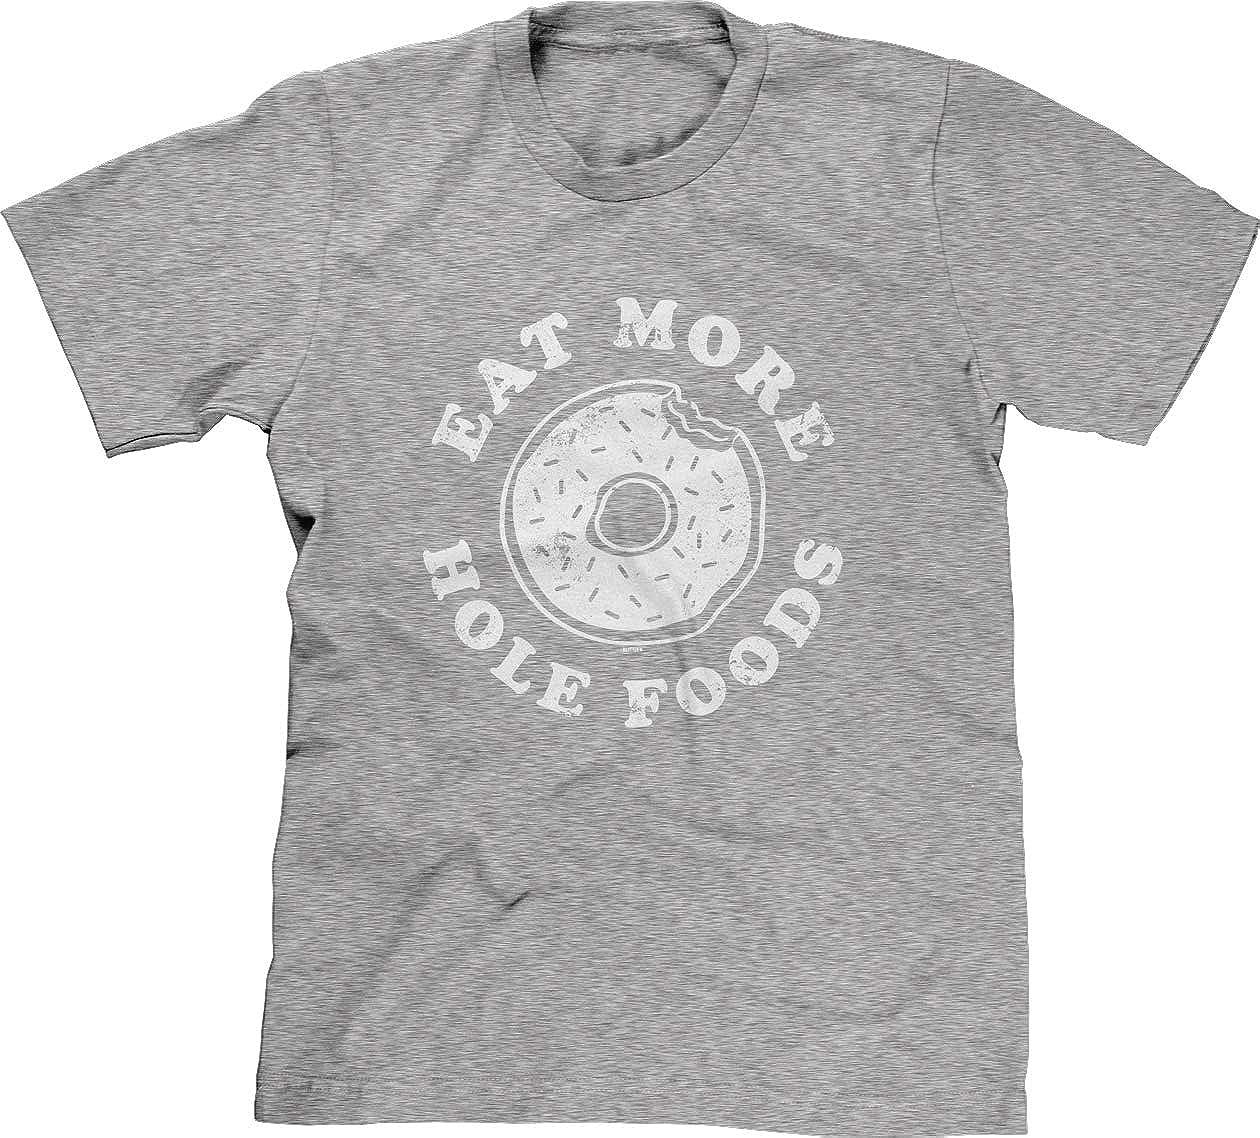 Blittzen Mens T-Shirt Eat More Hole Foods - Donut Pun Joke